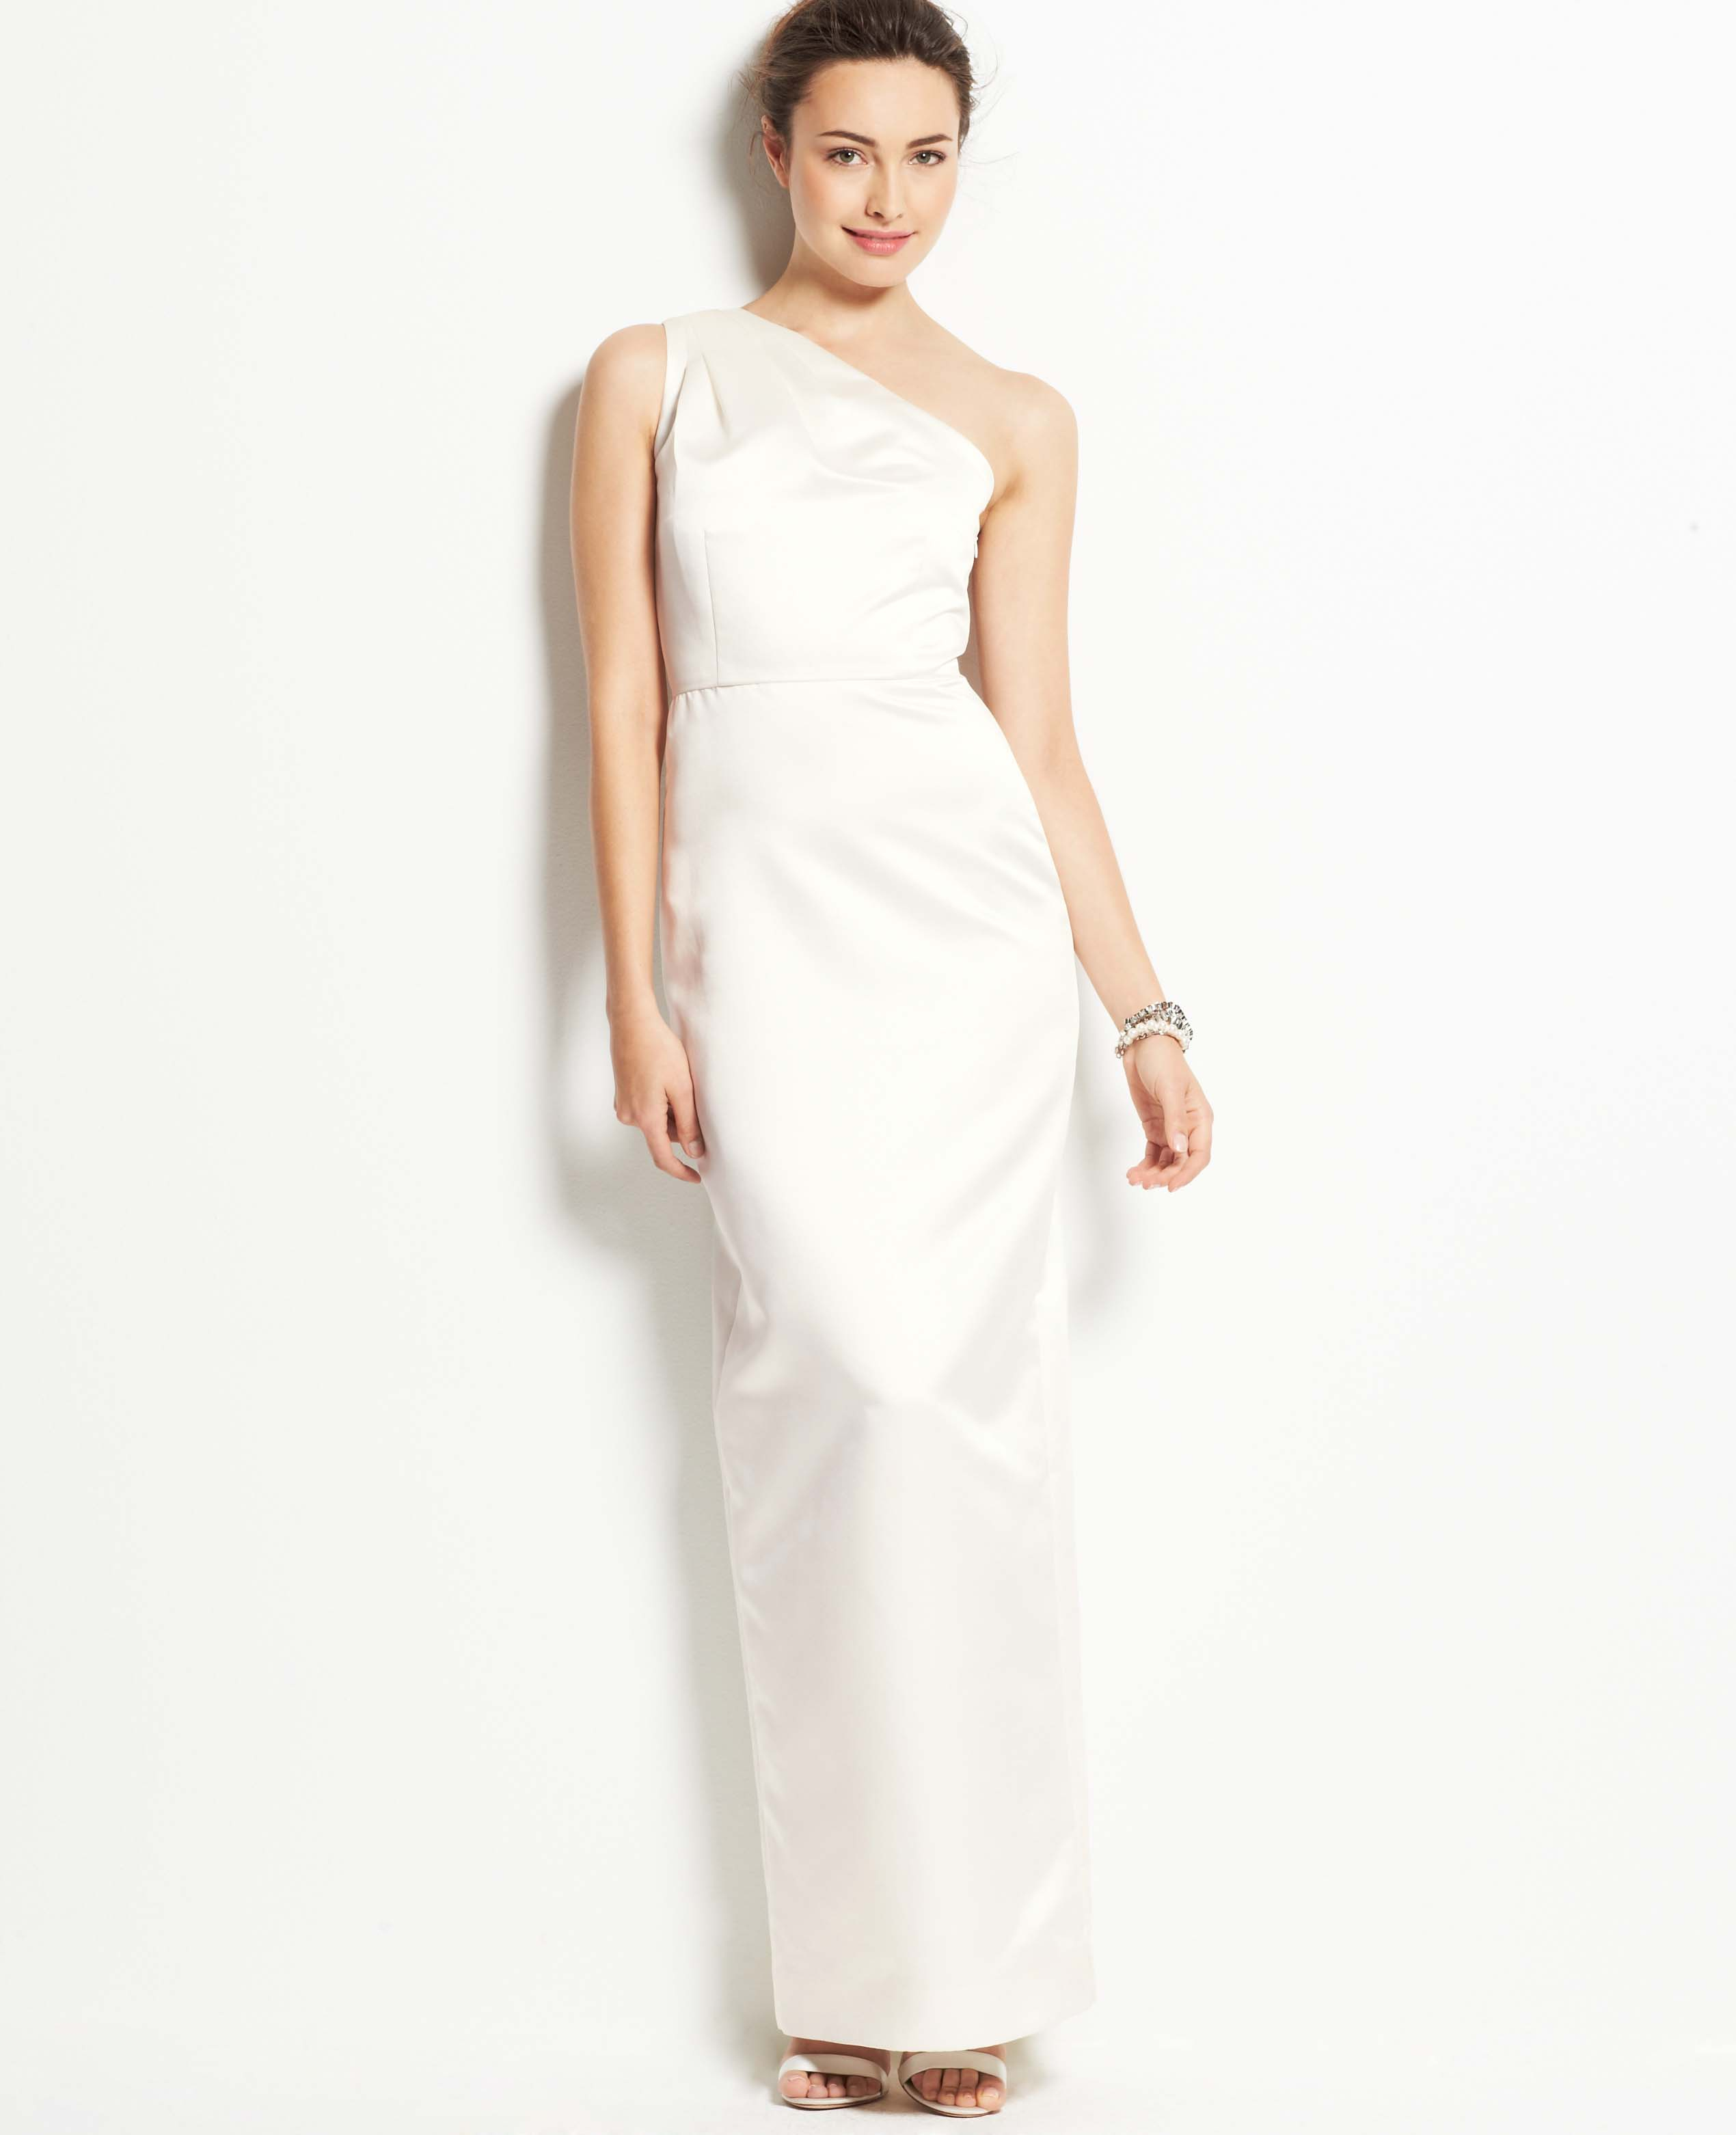 Silk One Shoulder Wedding Dress